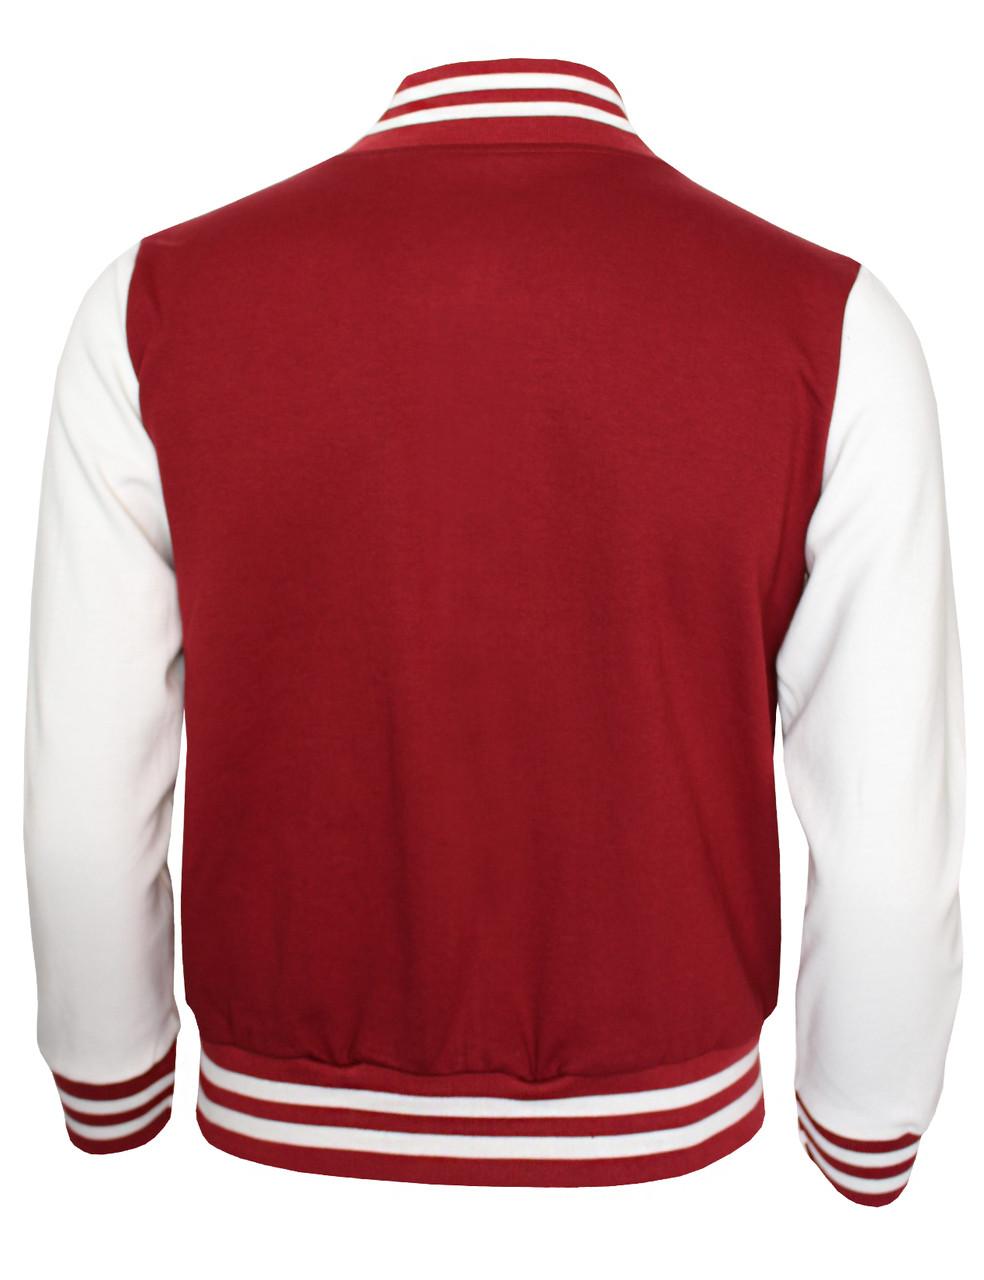 The-Tops Womens Baseball Jacket Varsity Cotton Letterman Jackets